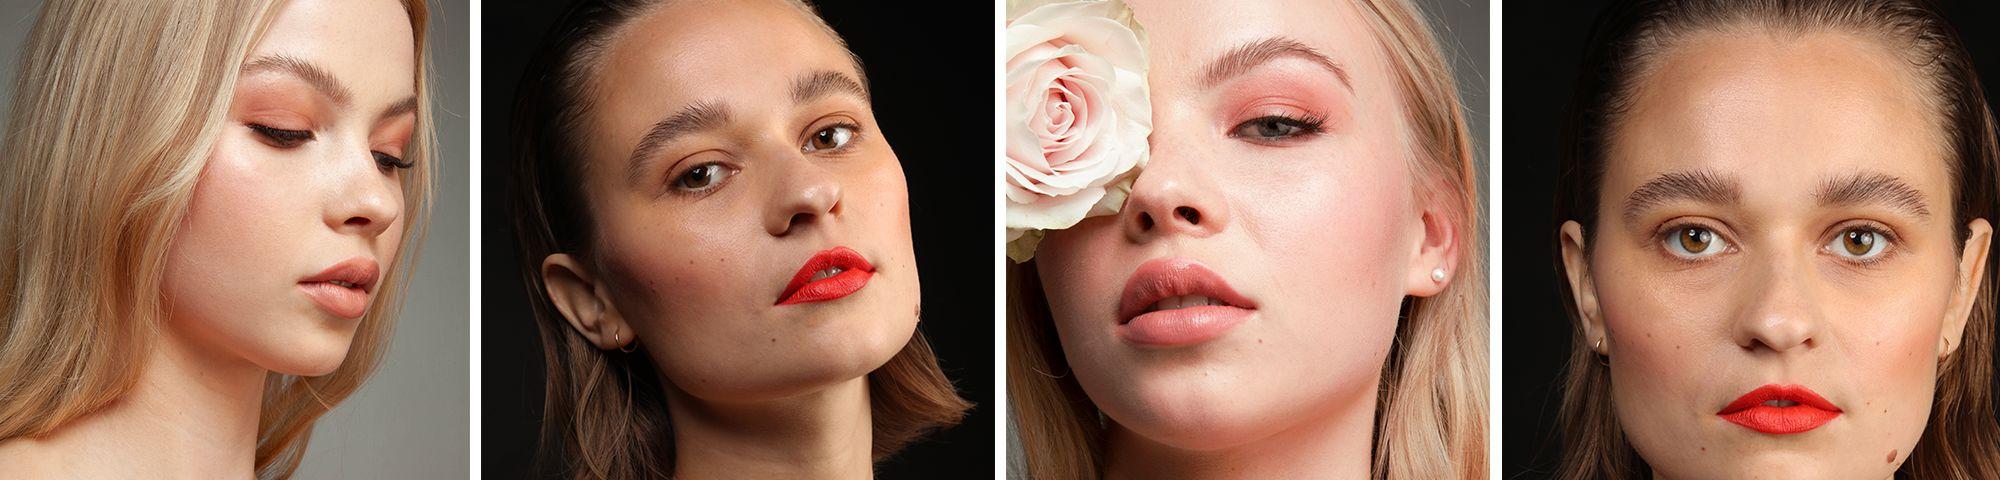 Kate Swindells Complete Makeup Artist Student Work 2019